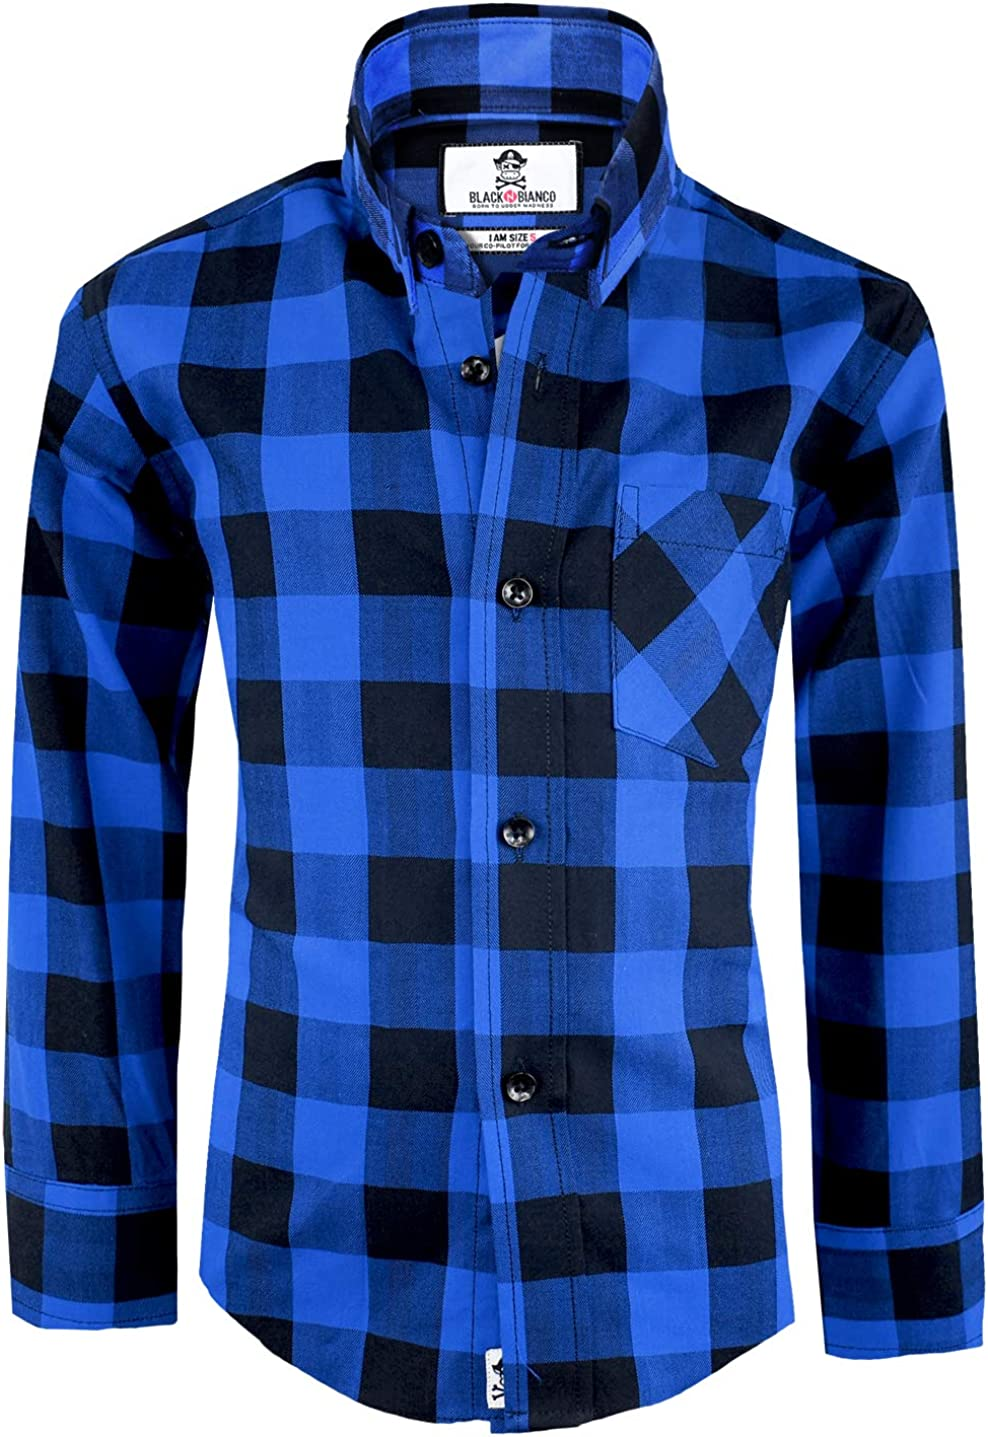 Black n Bianco Boys' Checkered Plaid Pr Dress Shirts price Down Button Wholesale